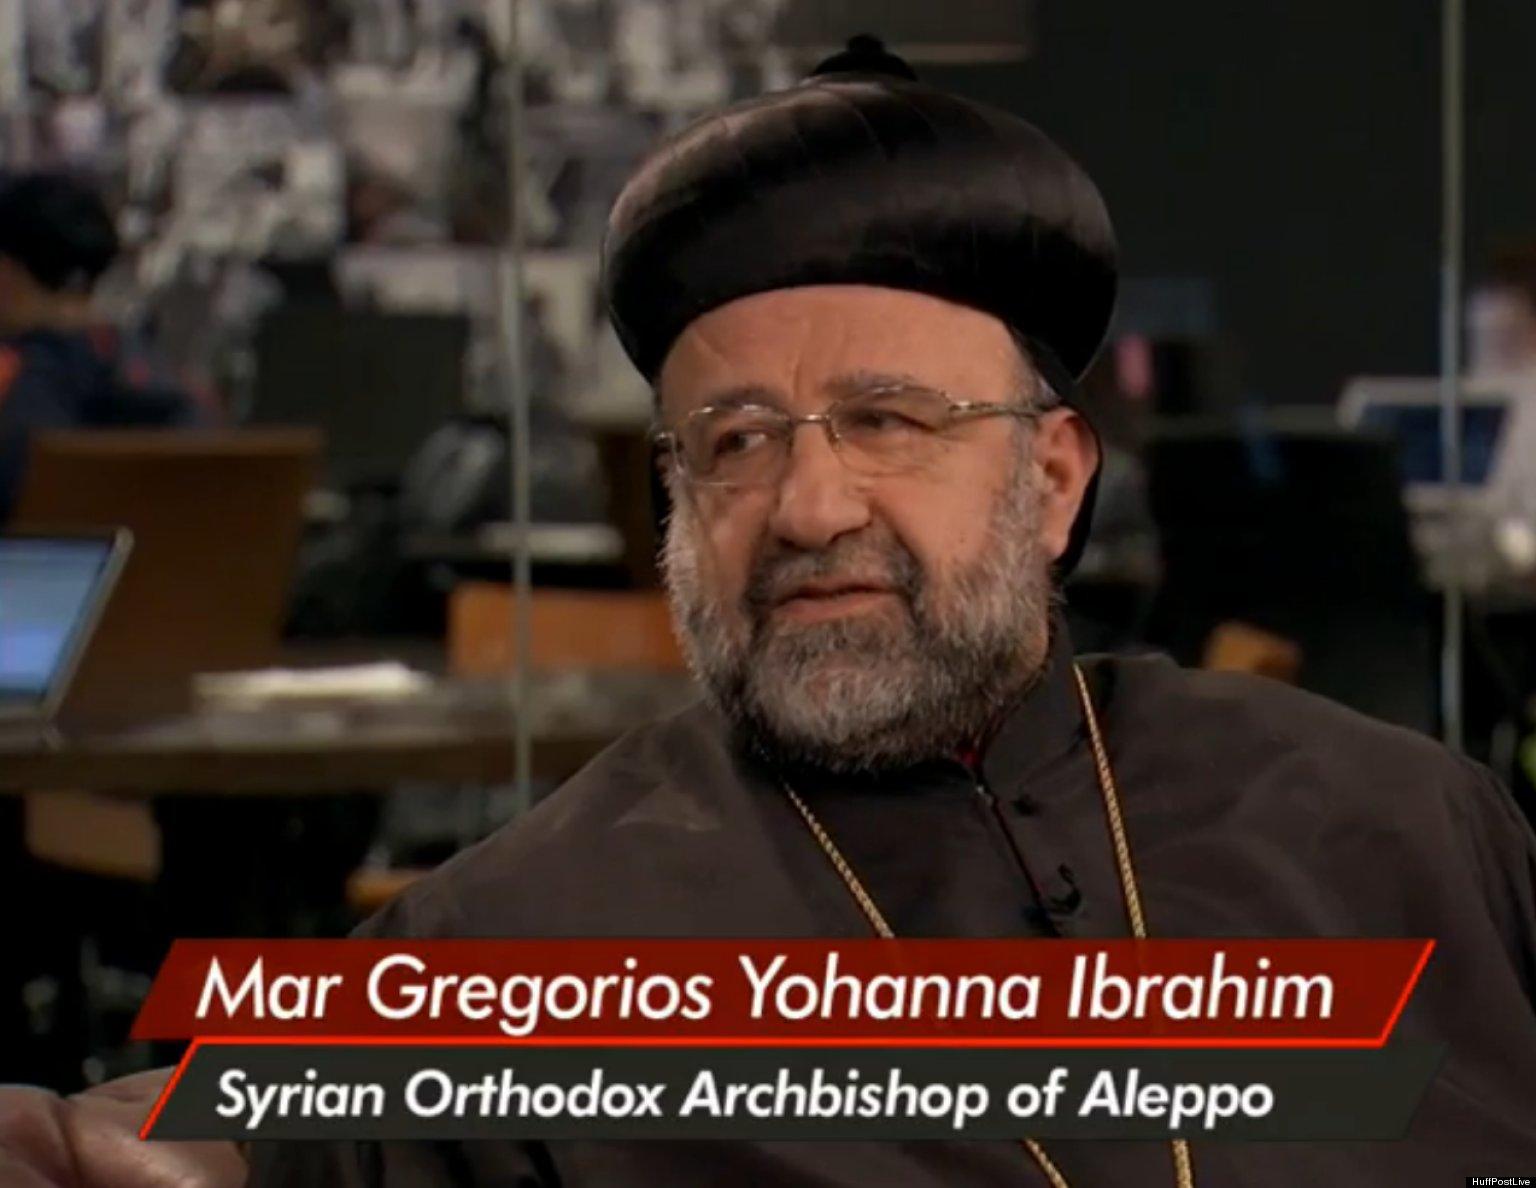 Mar Gregorios Yohanna Ibrahim, Syrian Archbishop Of Aleppo